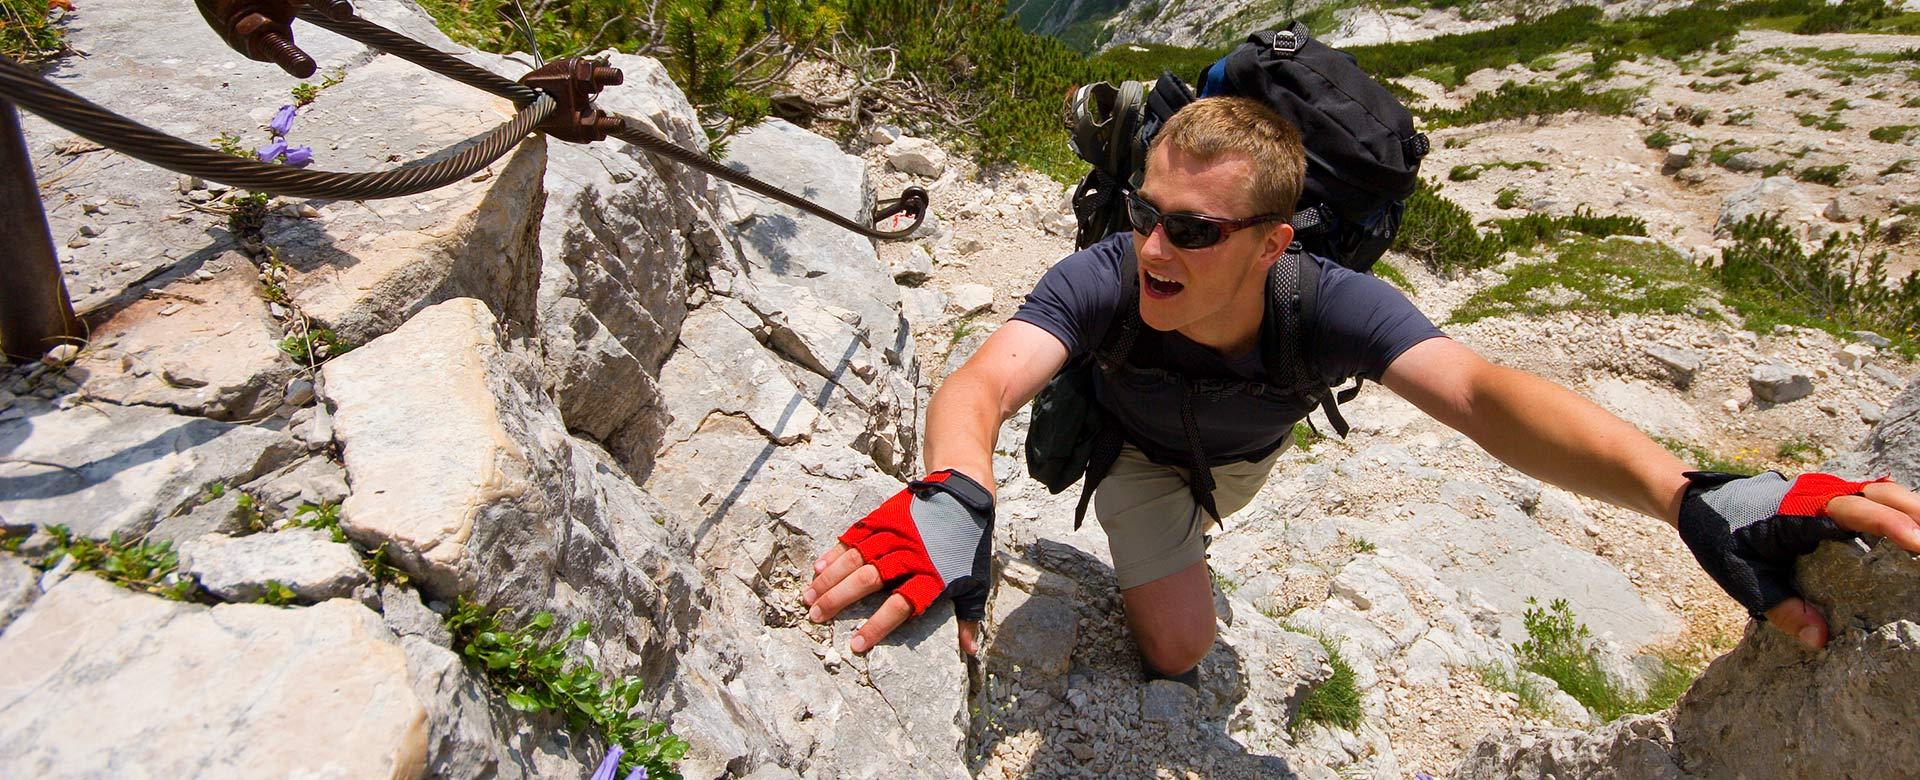 Man climbs up rocky path